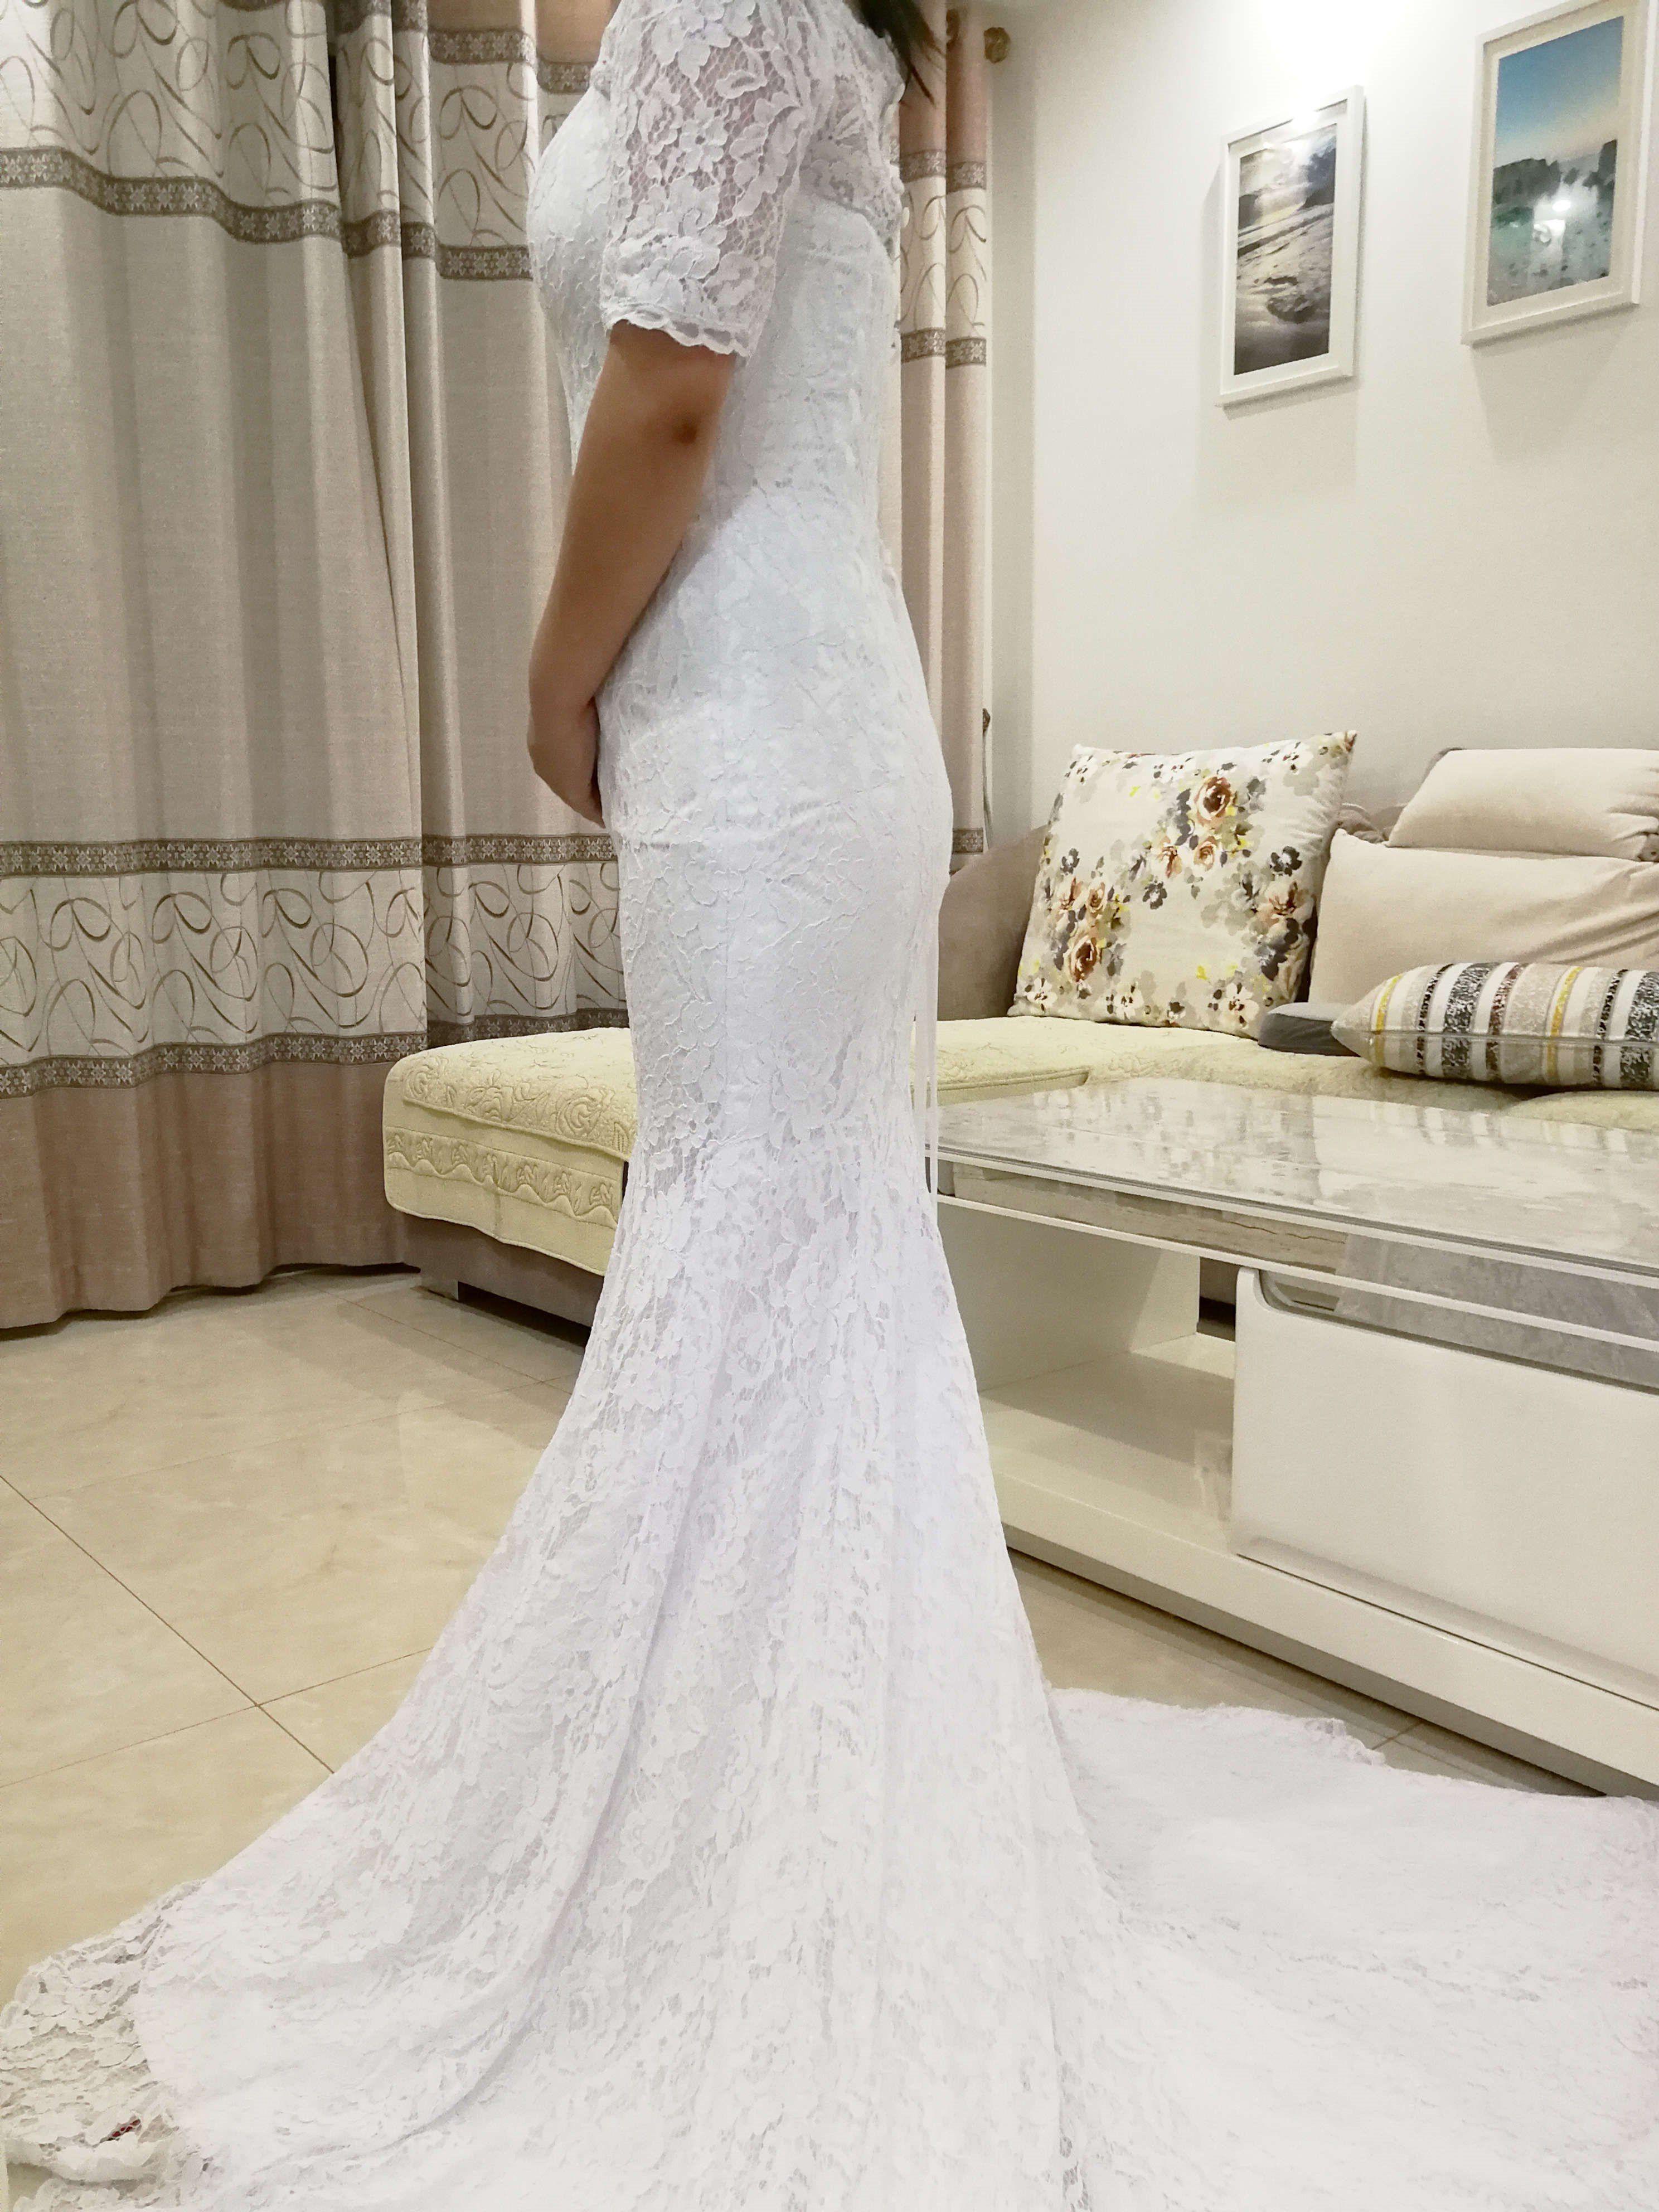 Tidebuy.com Wedding Dresses